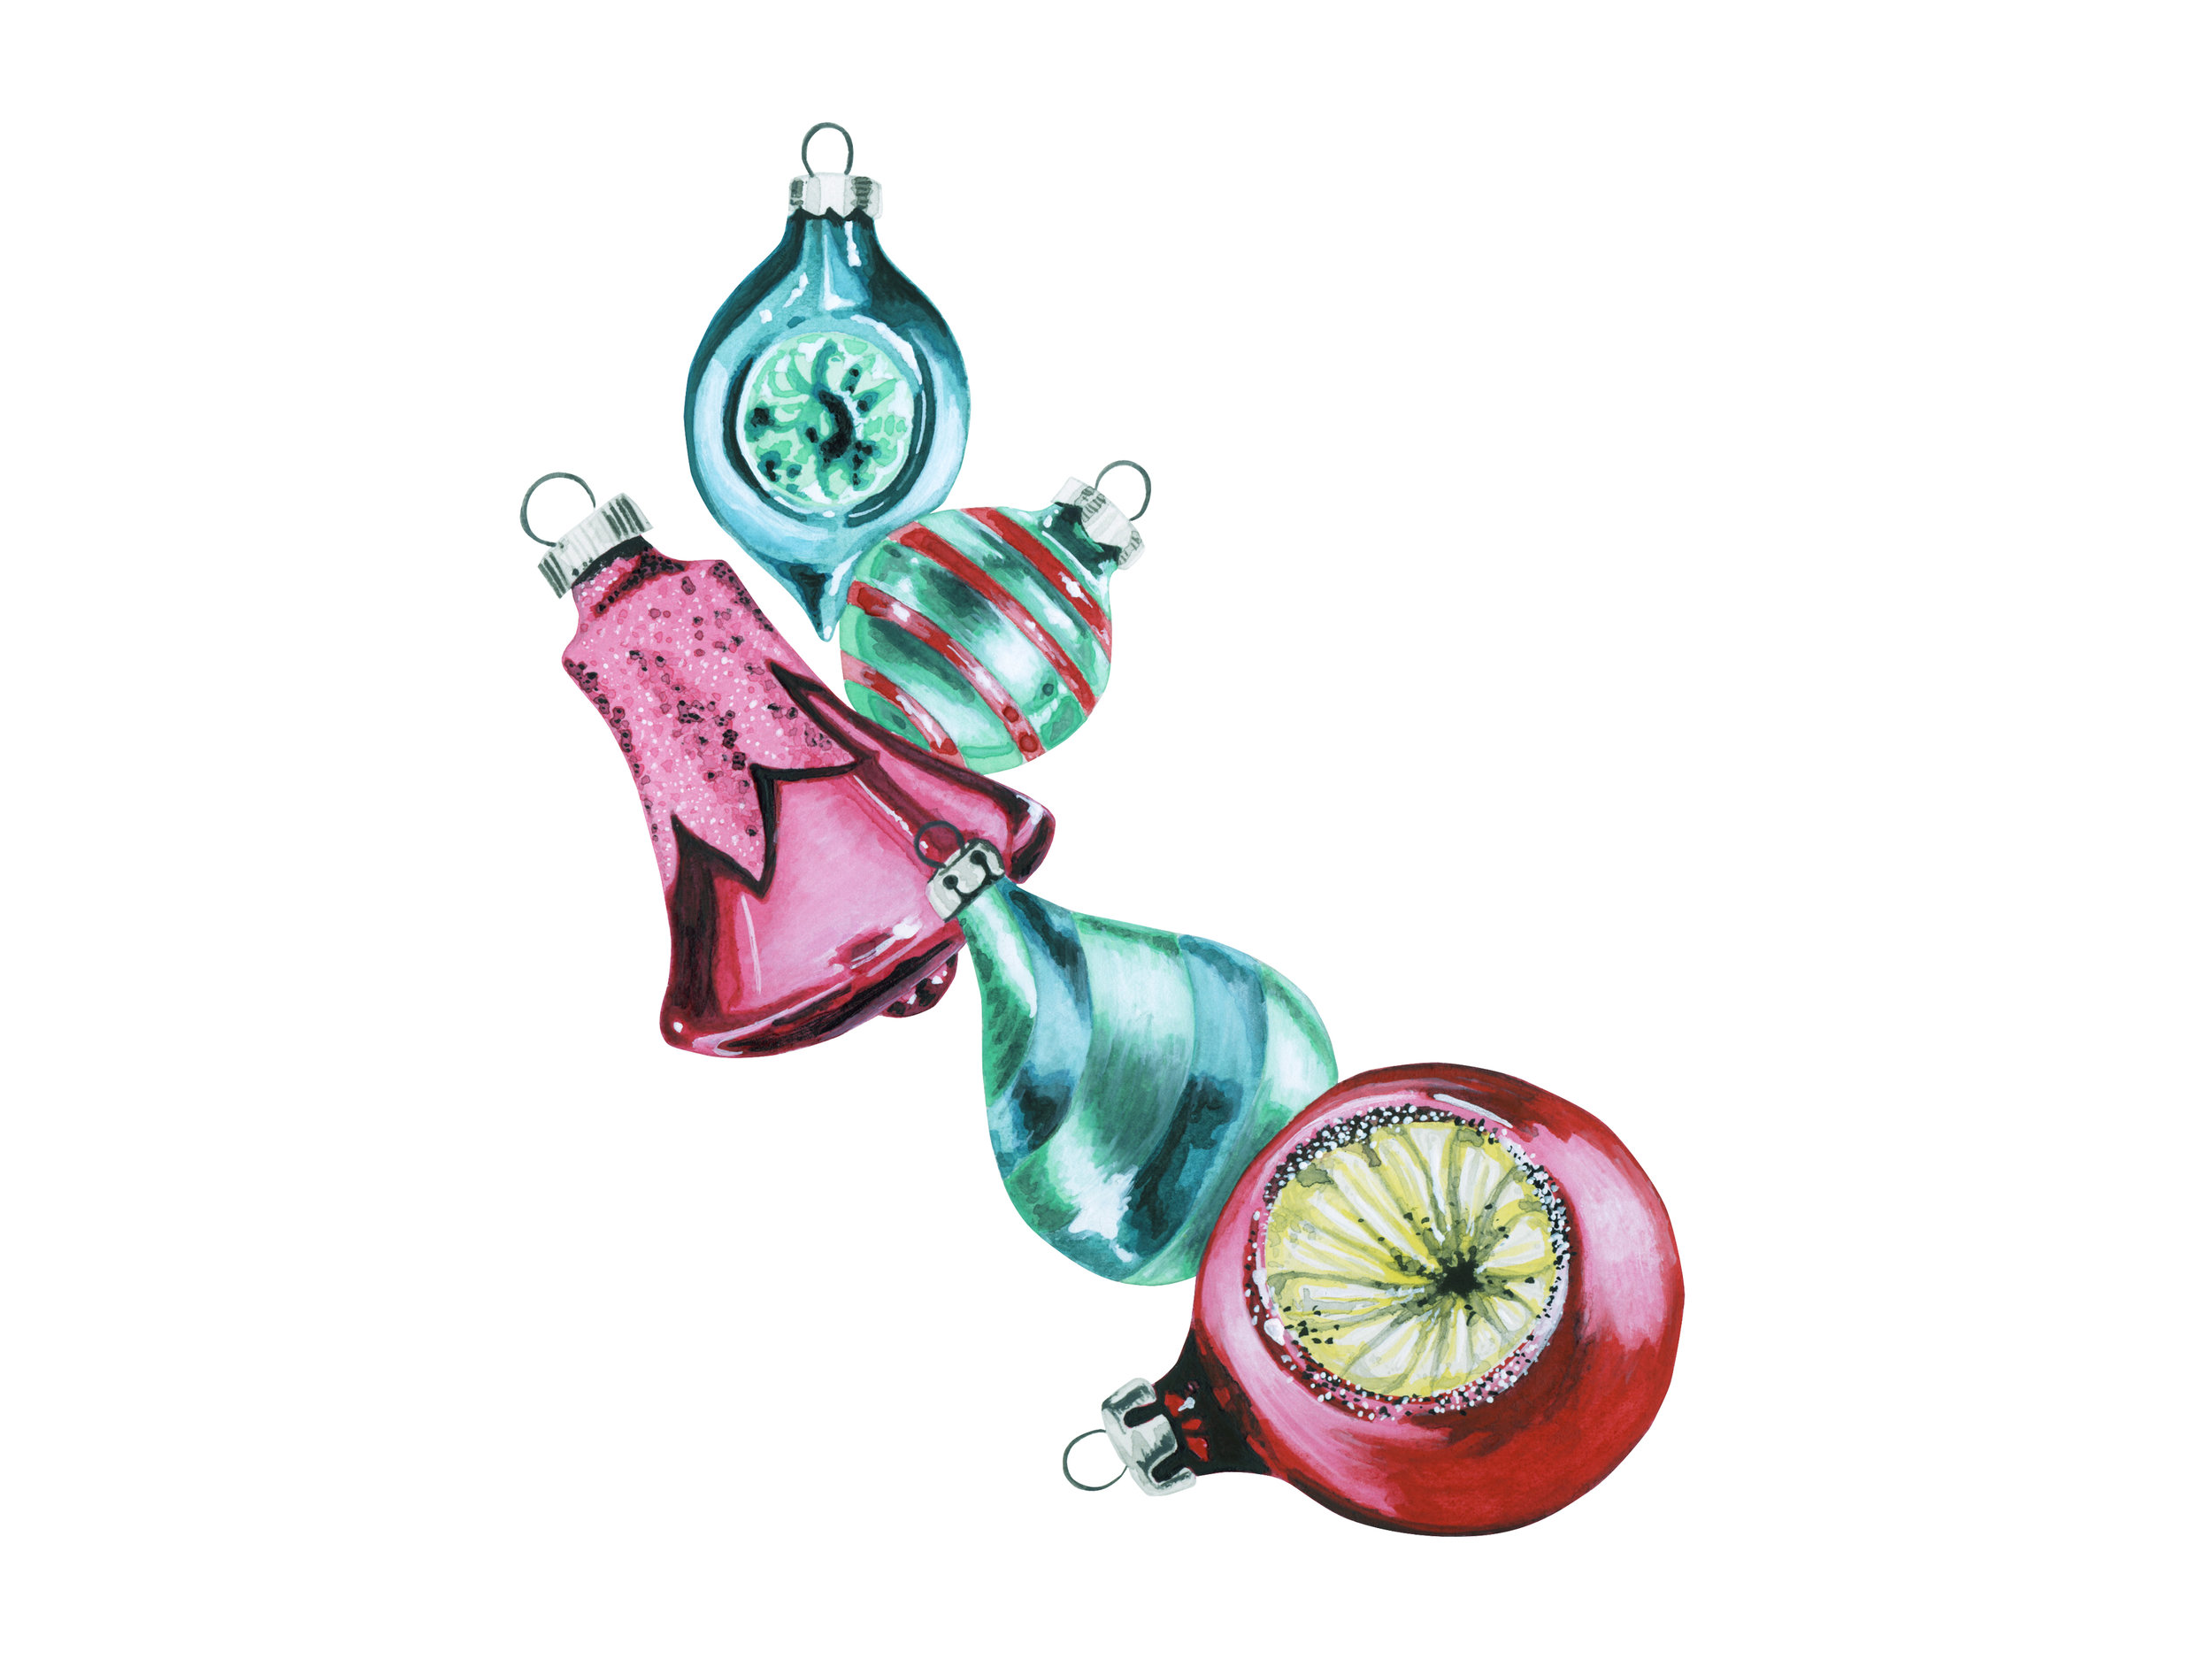 Shiny + Brite Vintage Ornaments